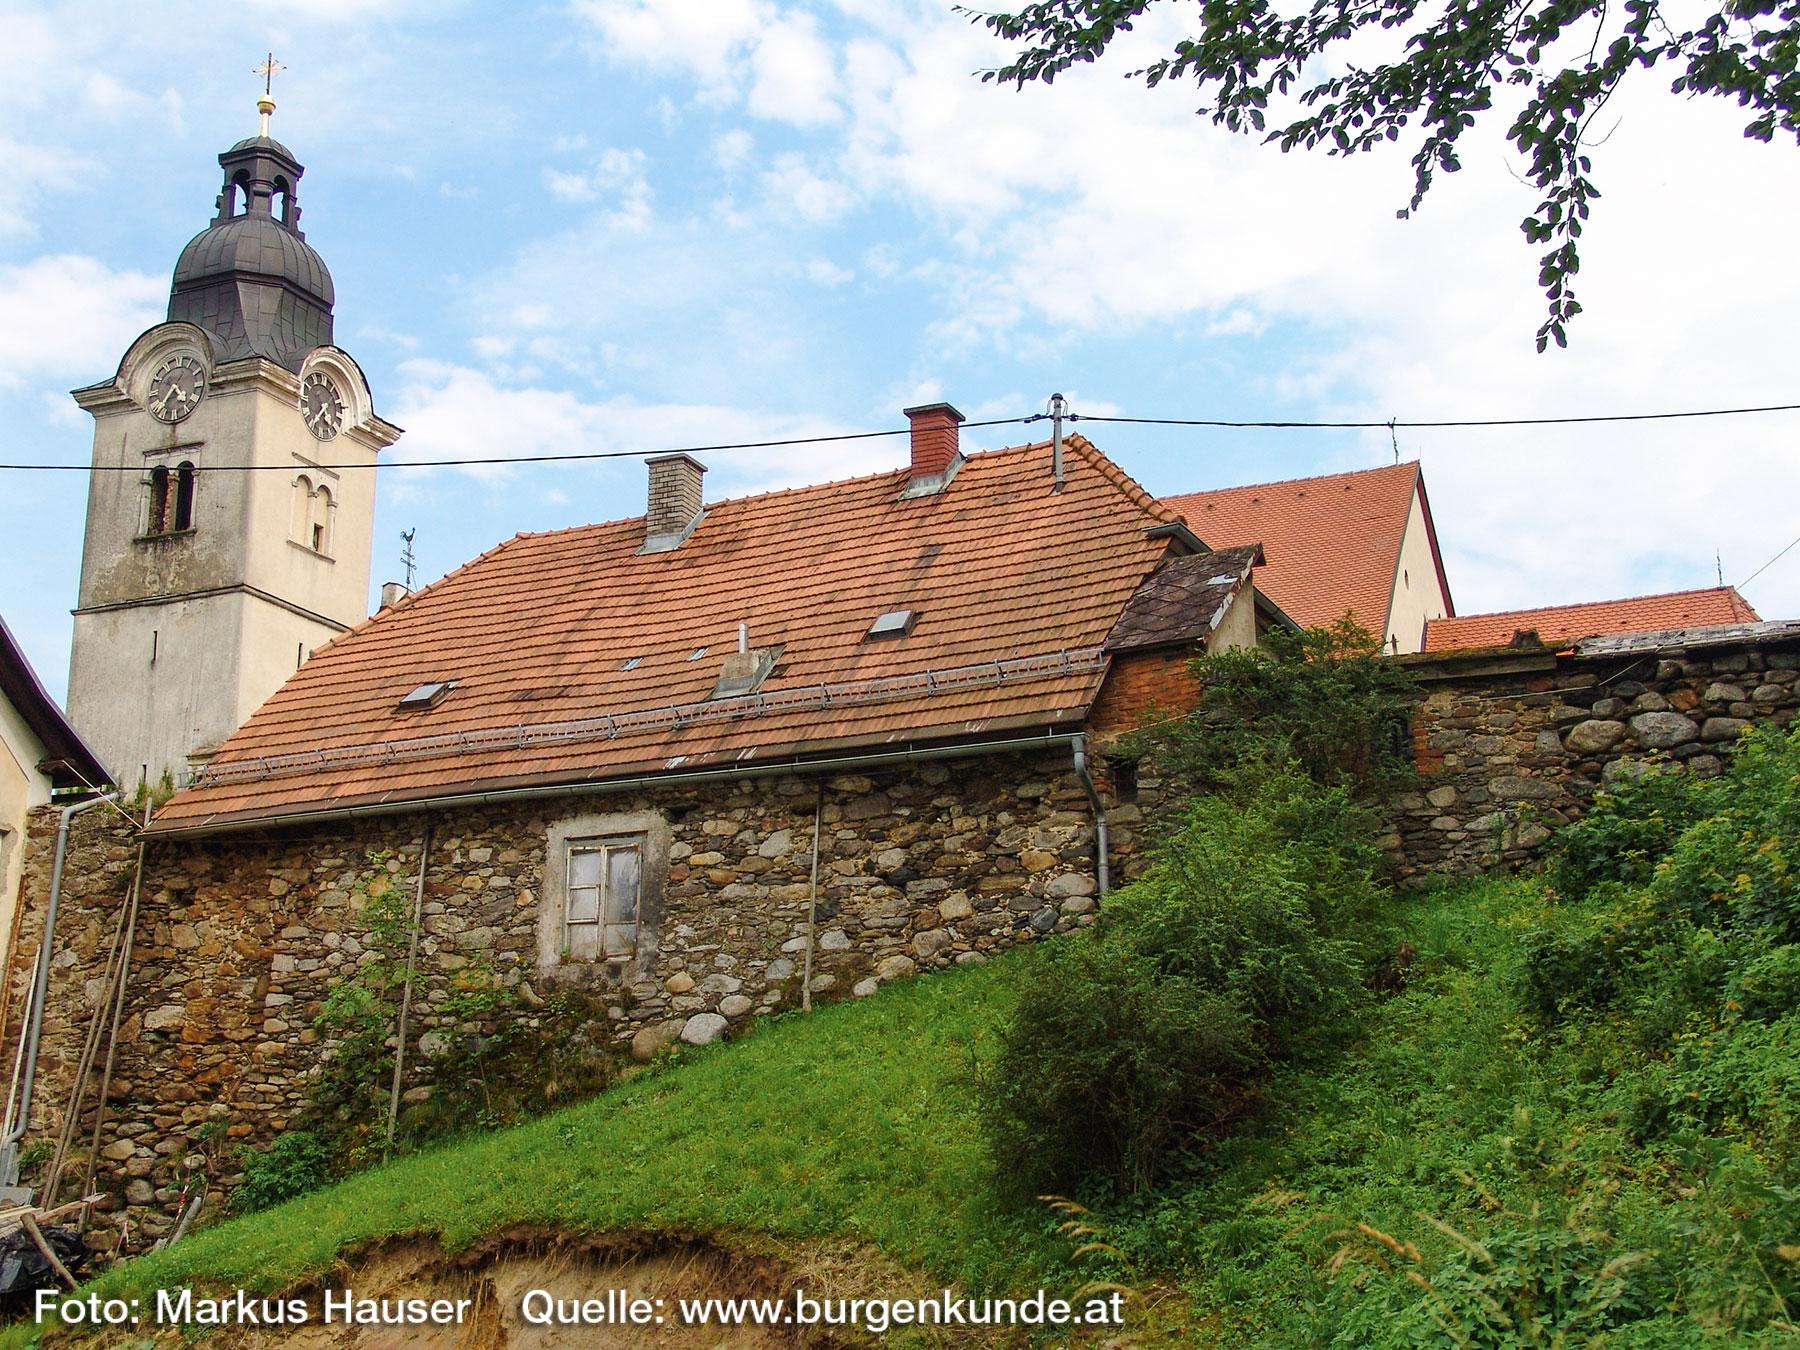 Burgruine-Gomarn-Bad-St-Leonhard-Kaernten-047